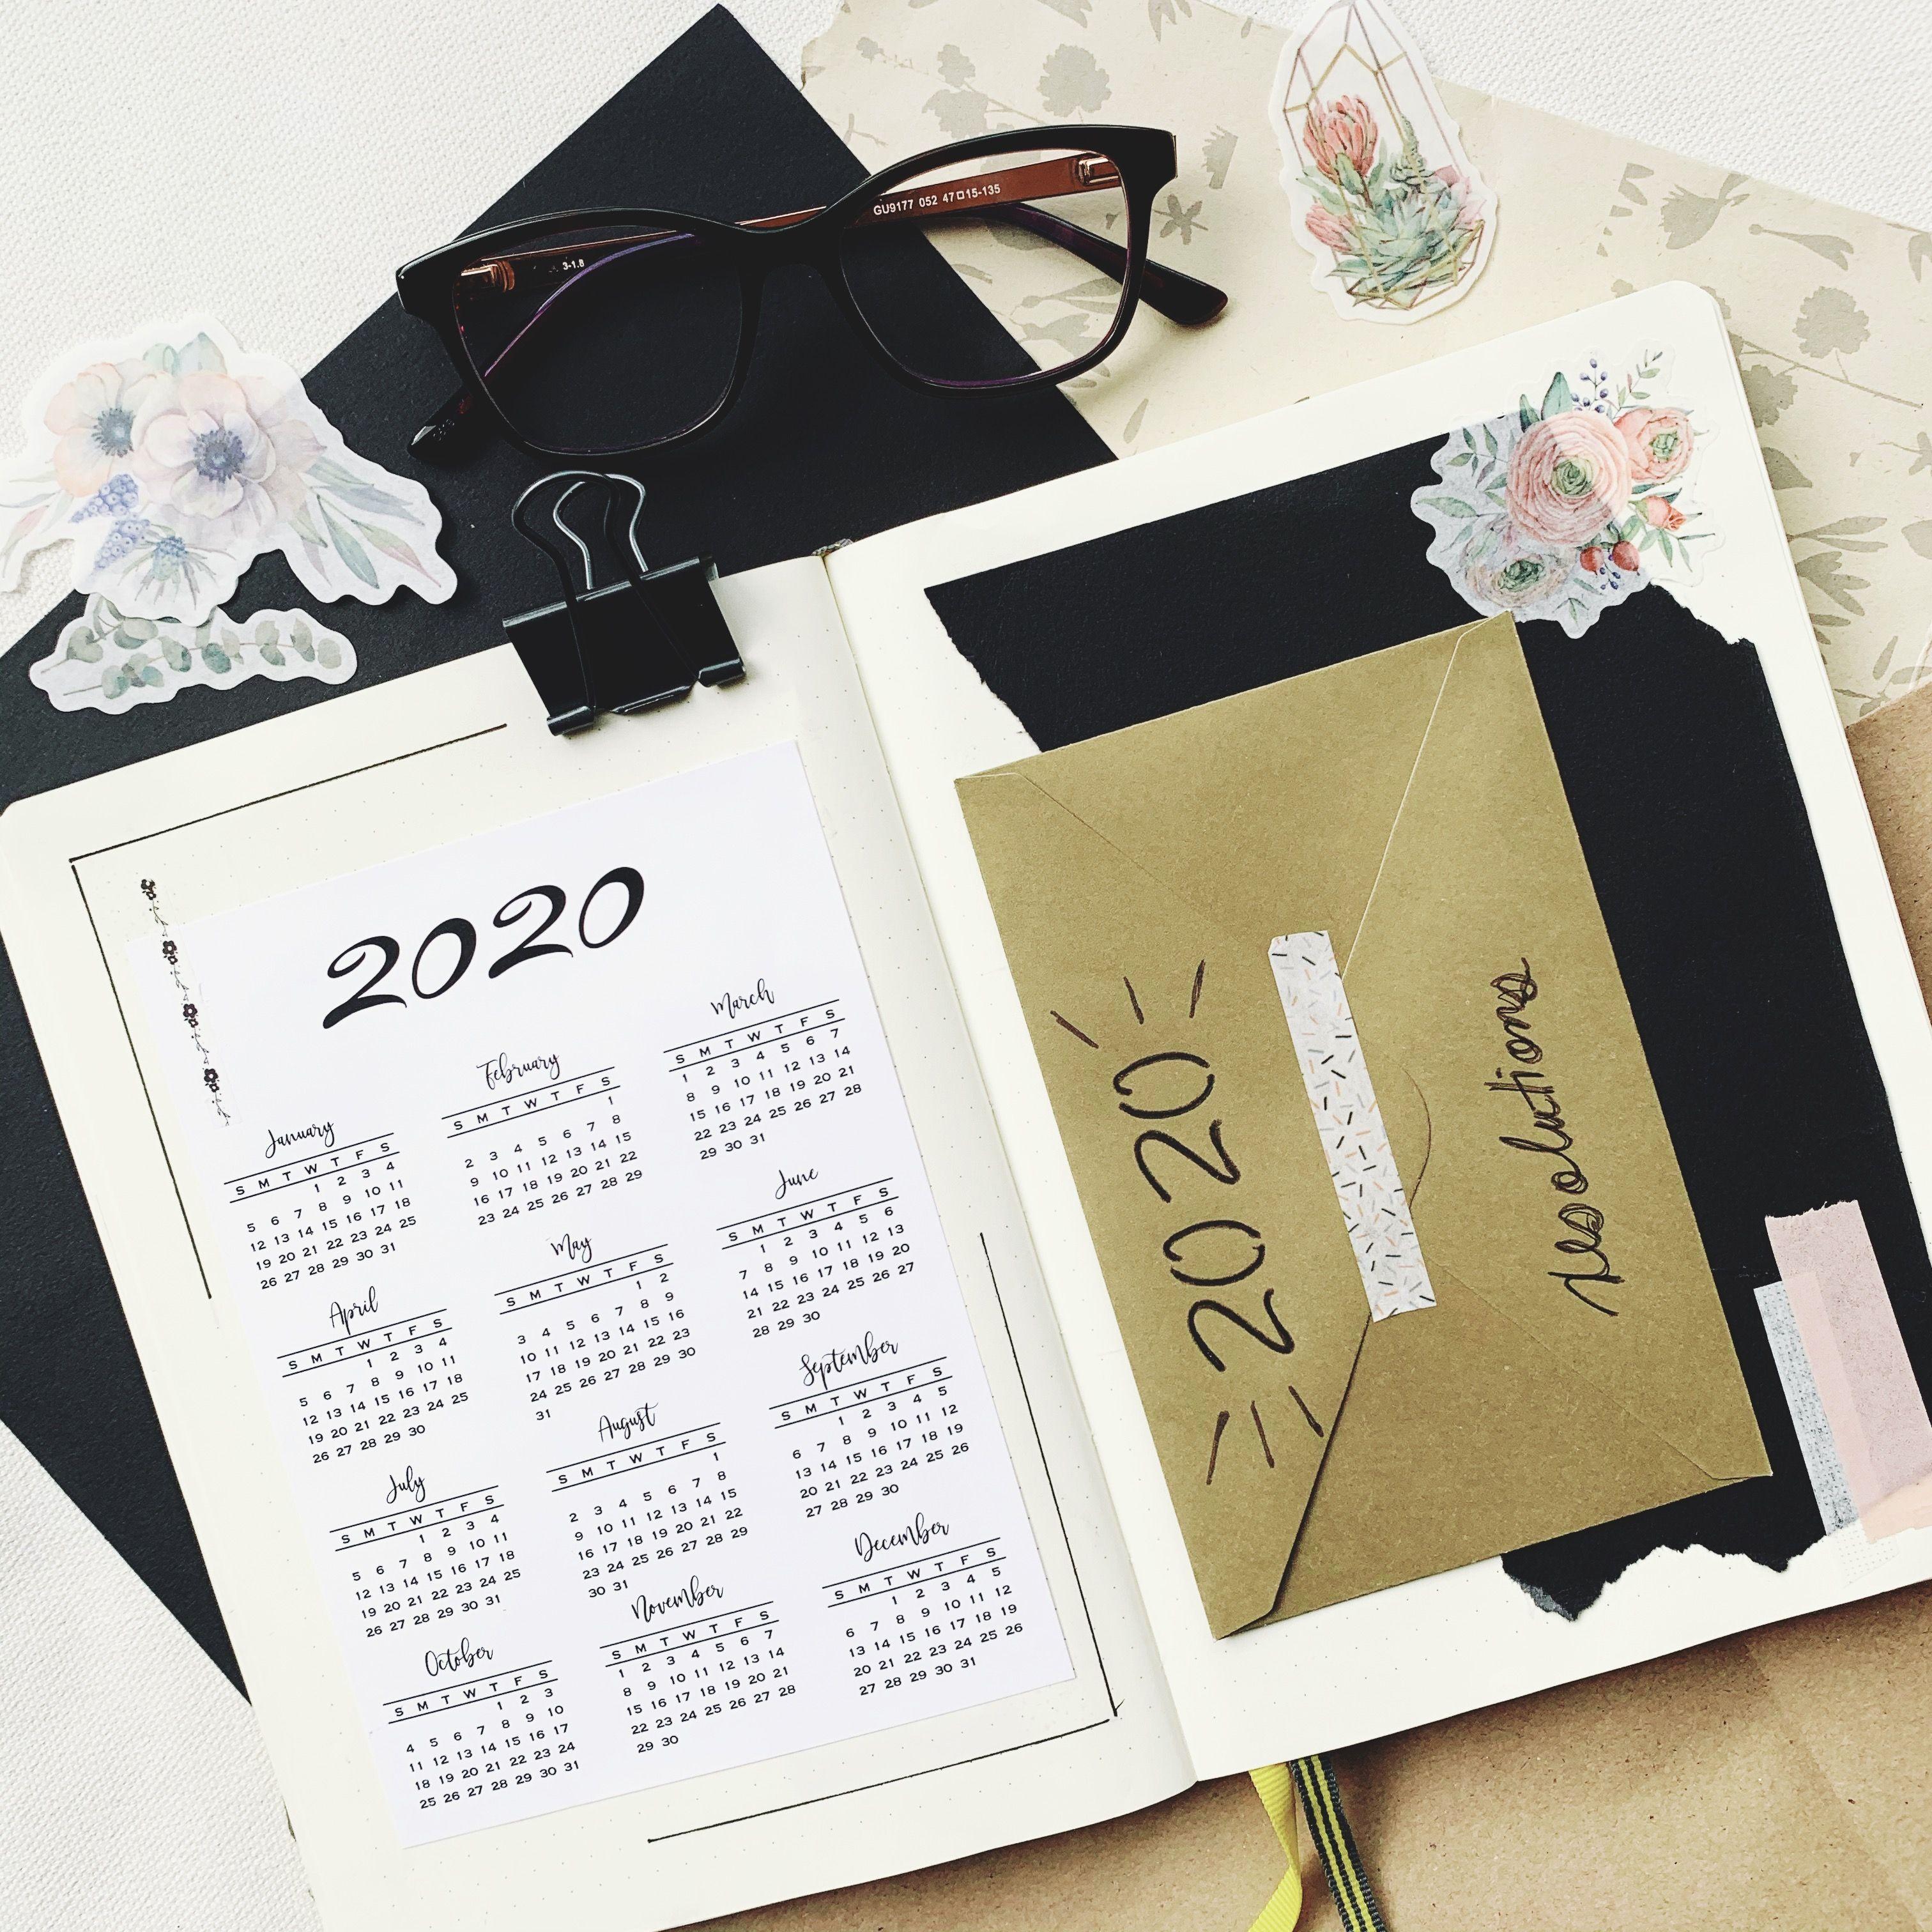 2020 bullet journal easy set up ideas